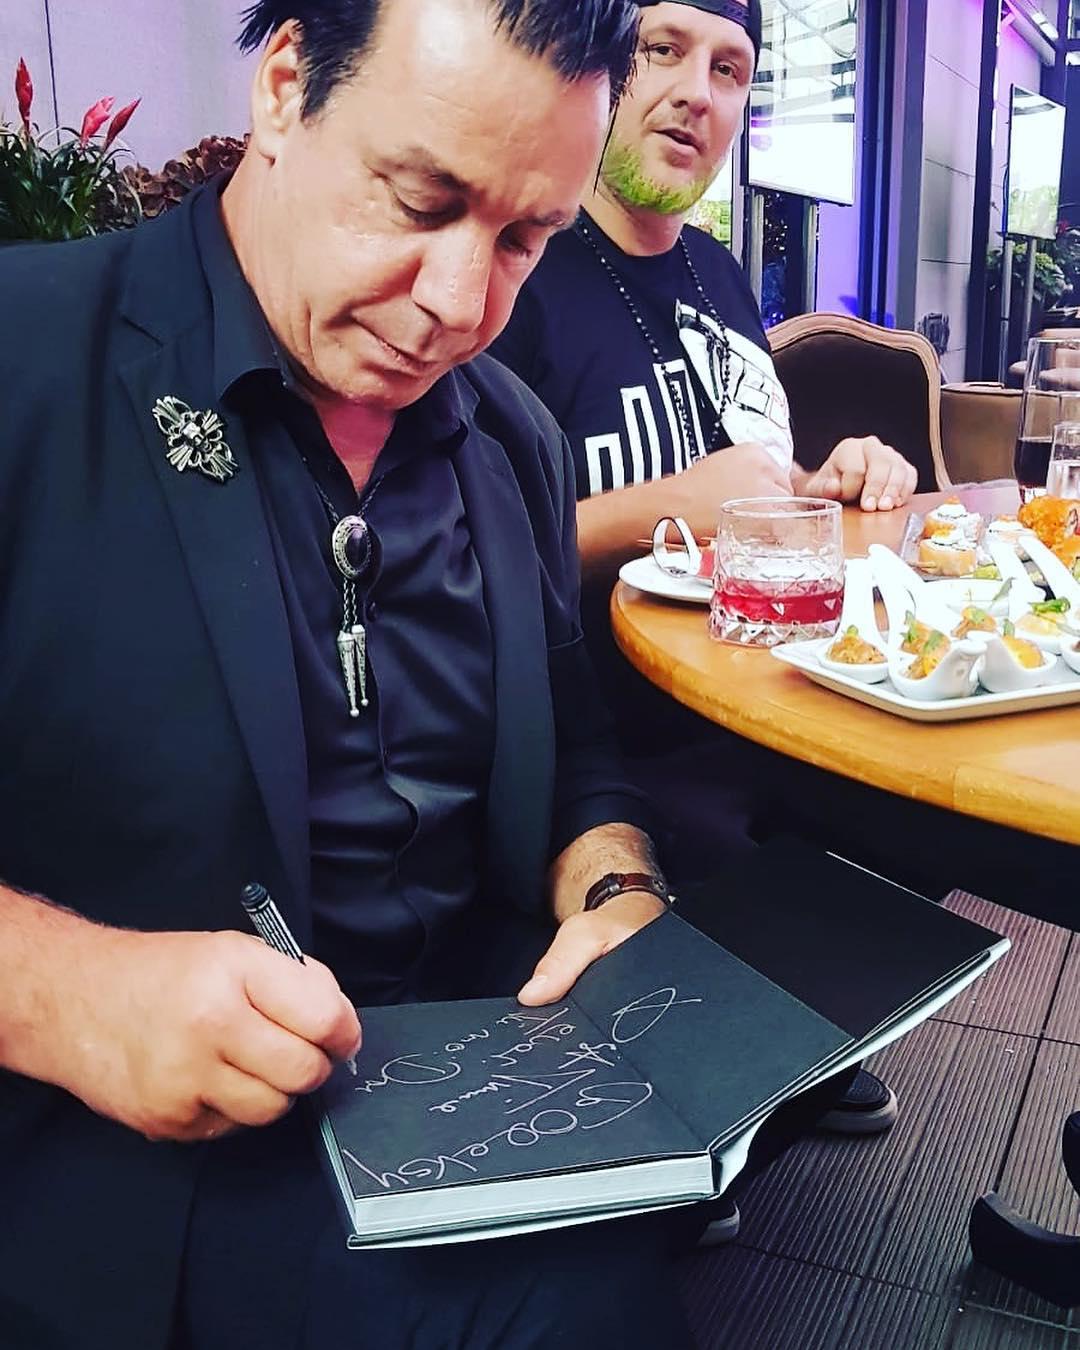 Линдеманн оставил автограф Потапу